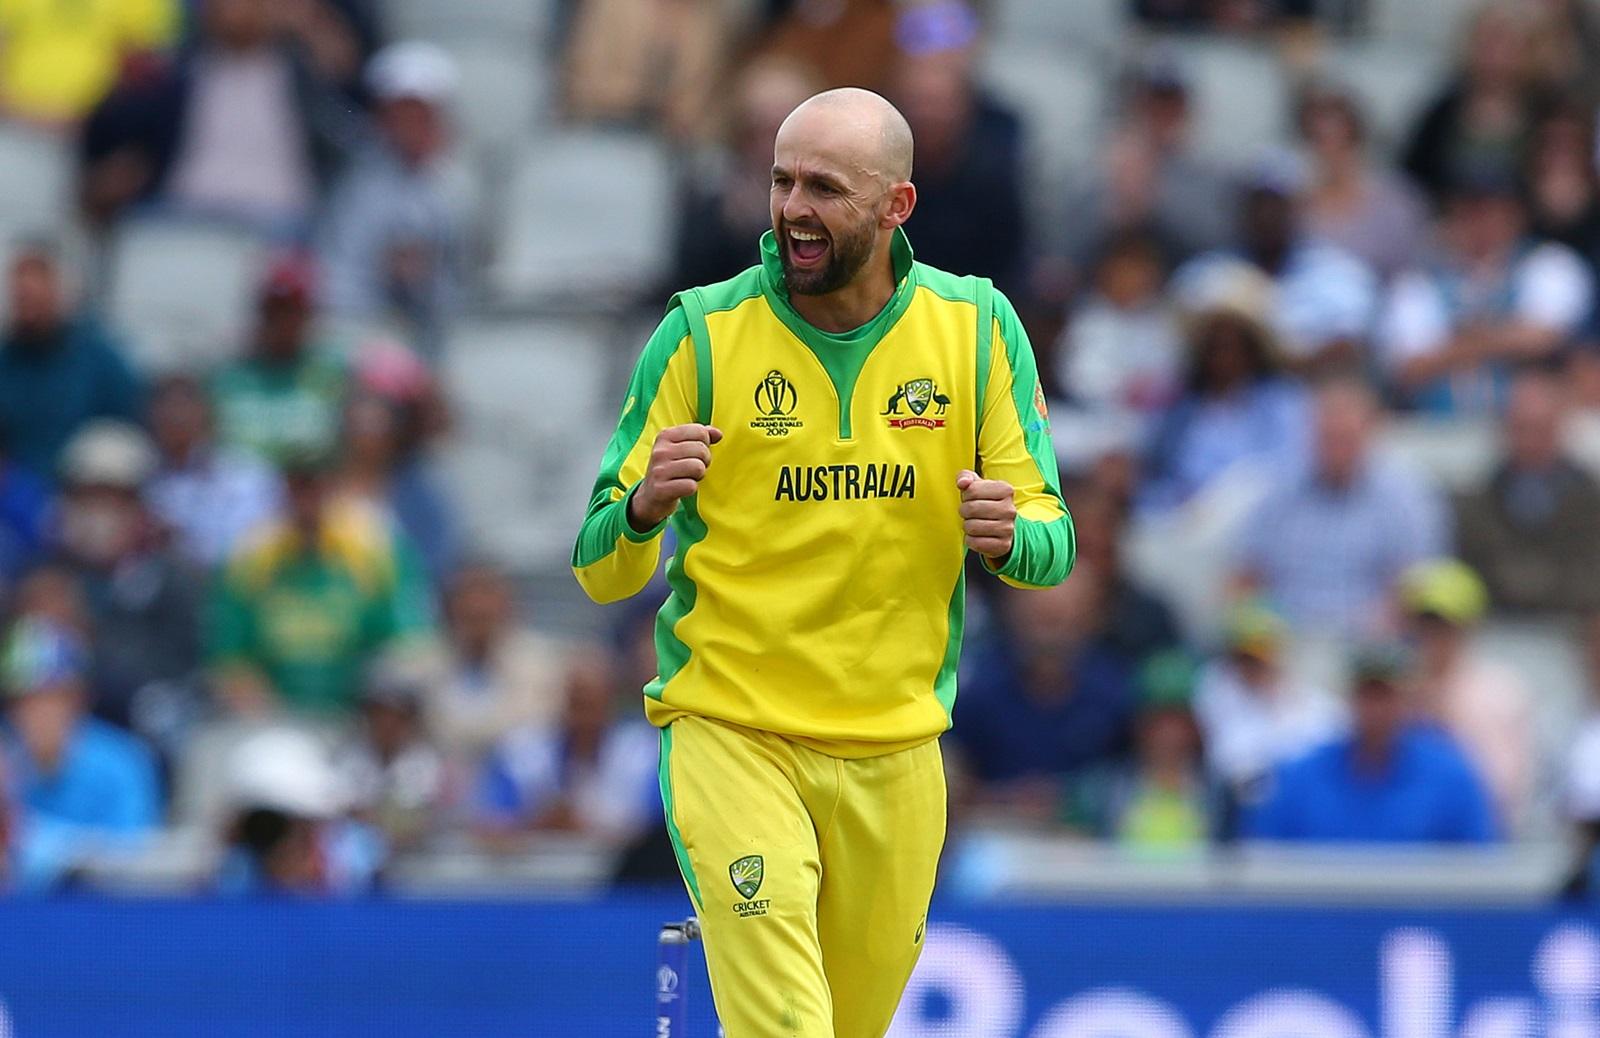 Lyon Lumps Pressure On England For Cut Throat Semi Cricket